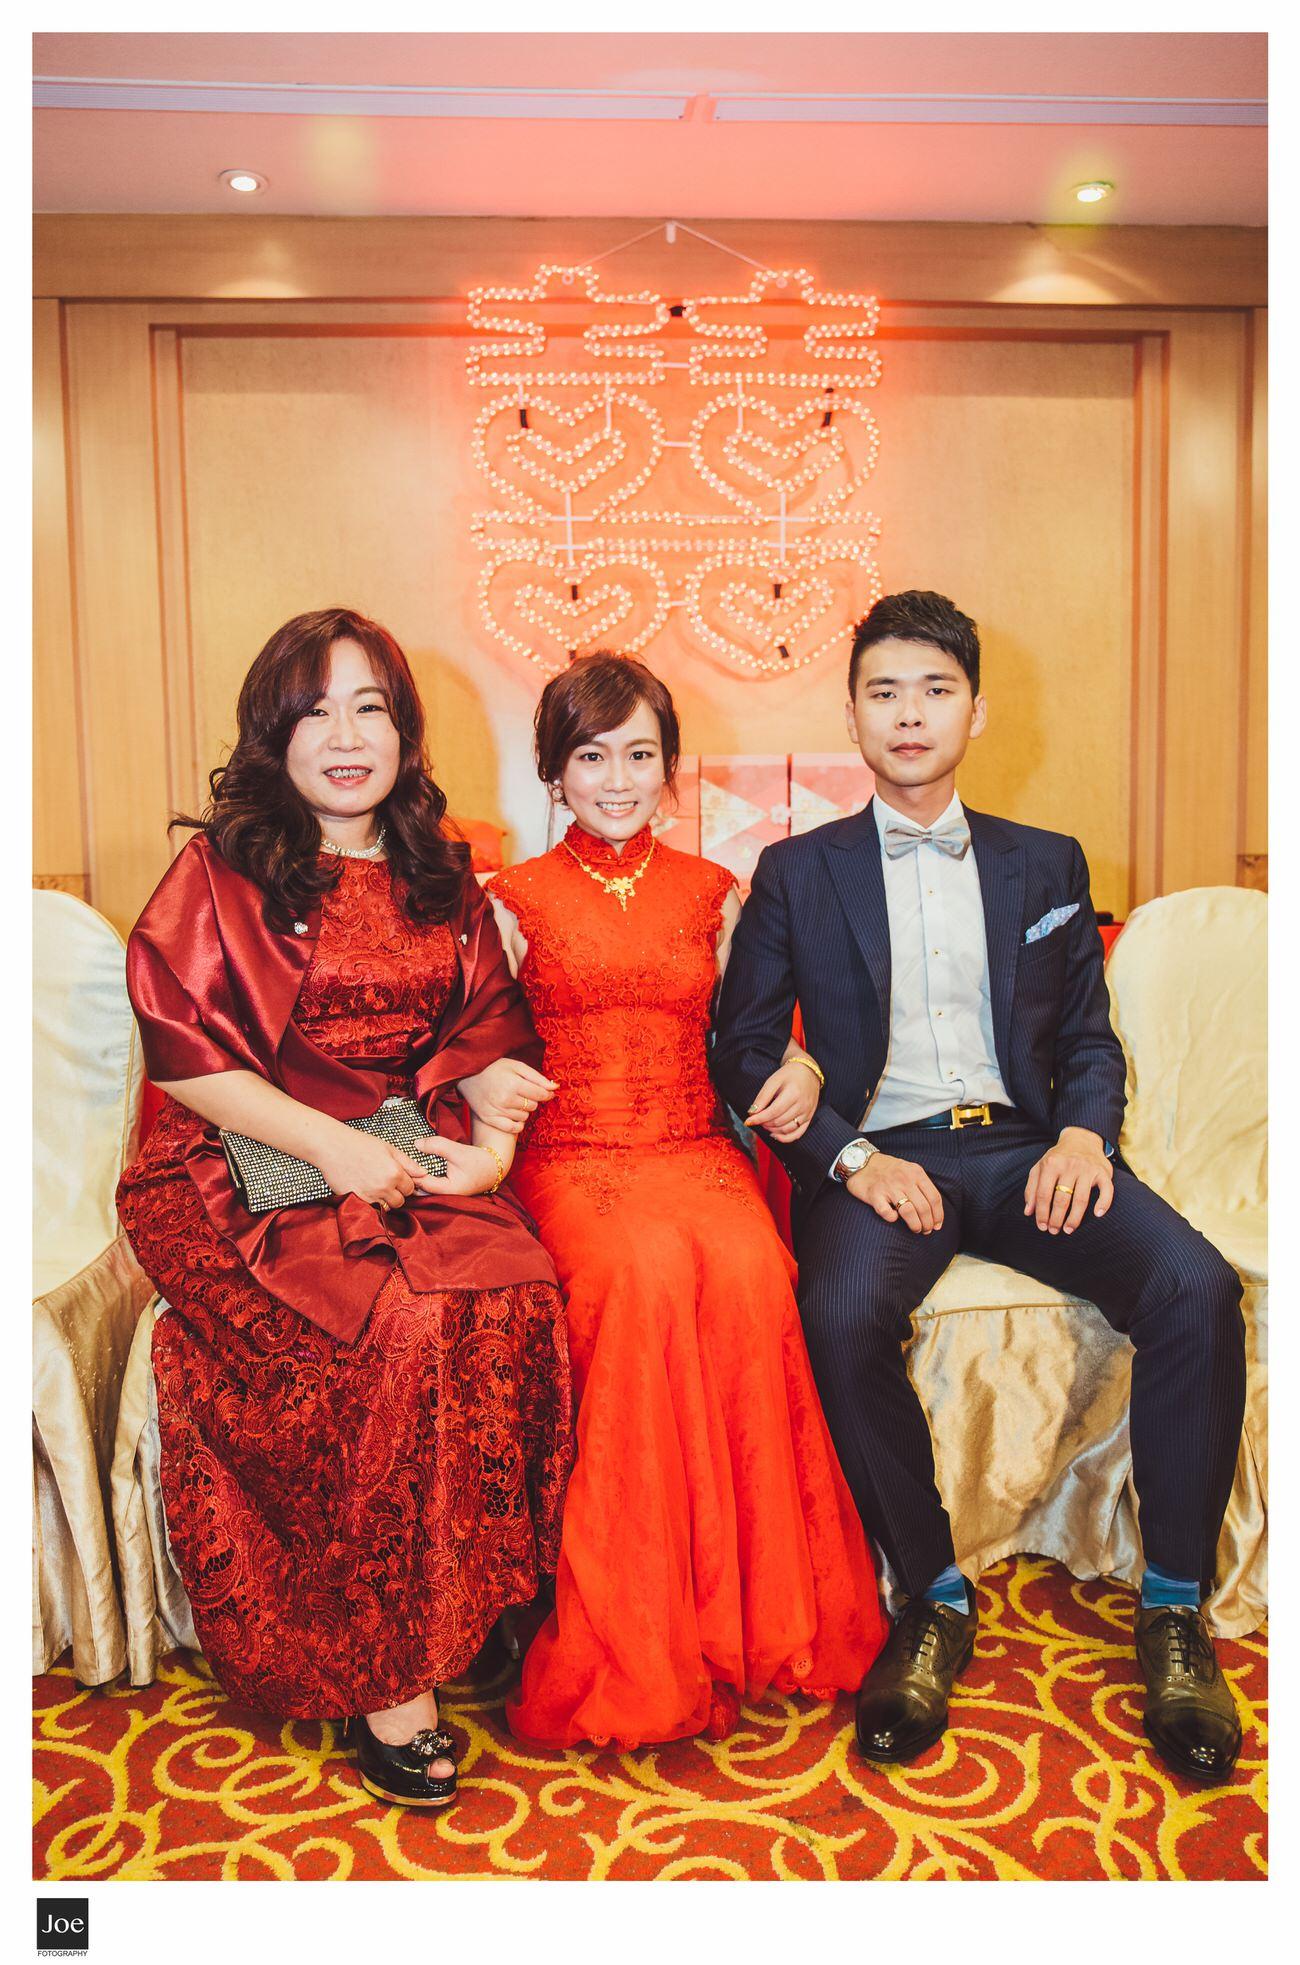 sunworld-dynasty-hotel-taipei-wedding-photo-joe-fotography-angel-jay-021.jpg